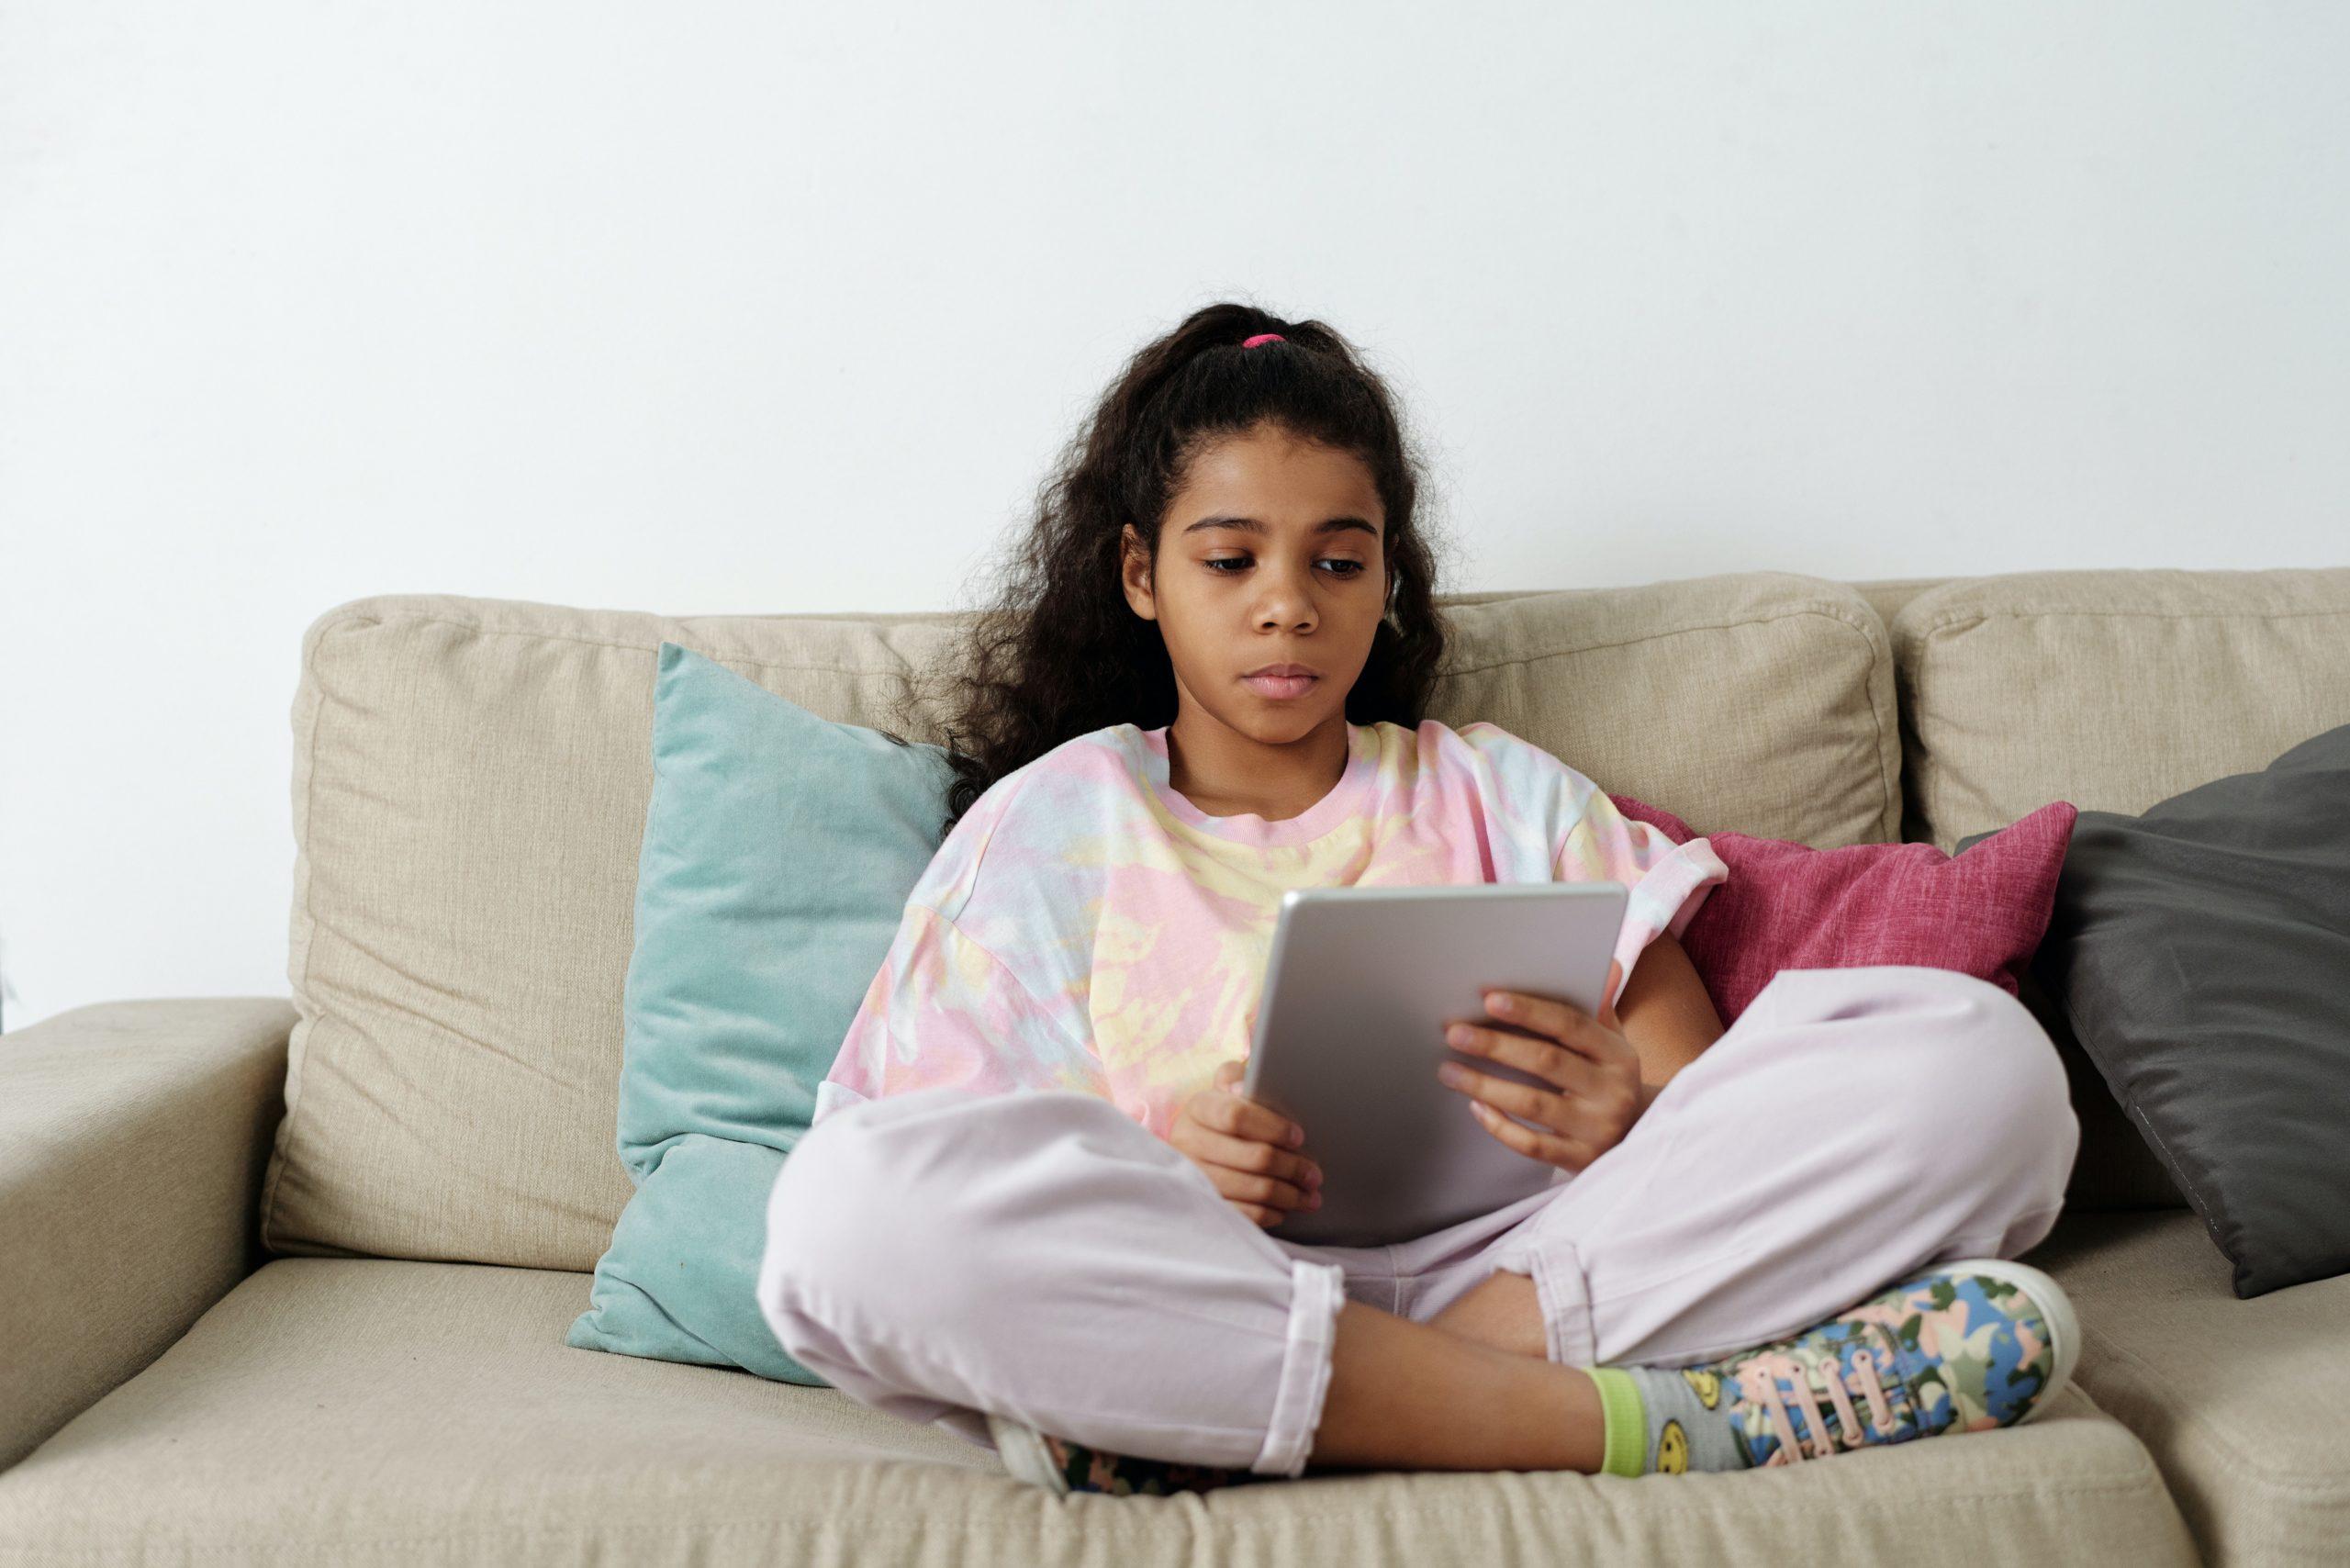 An anxious girl reading something on an iPad